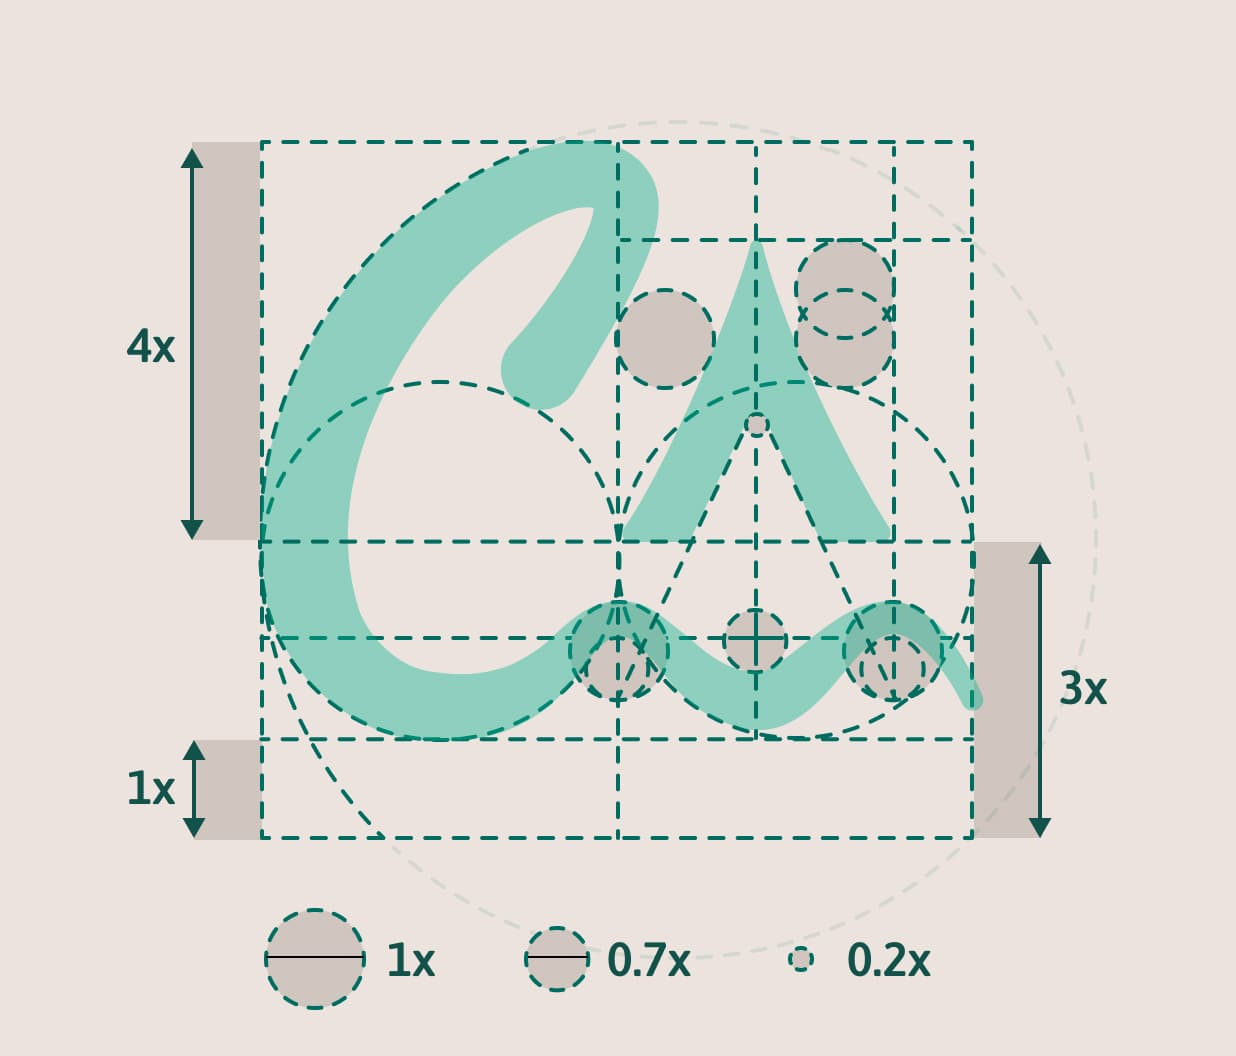 A grid representing the logo contruction.